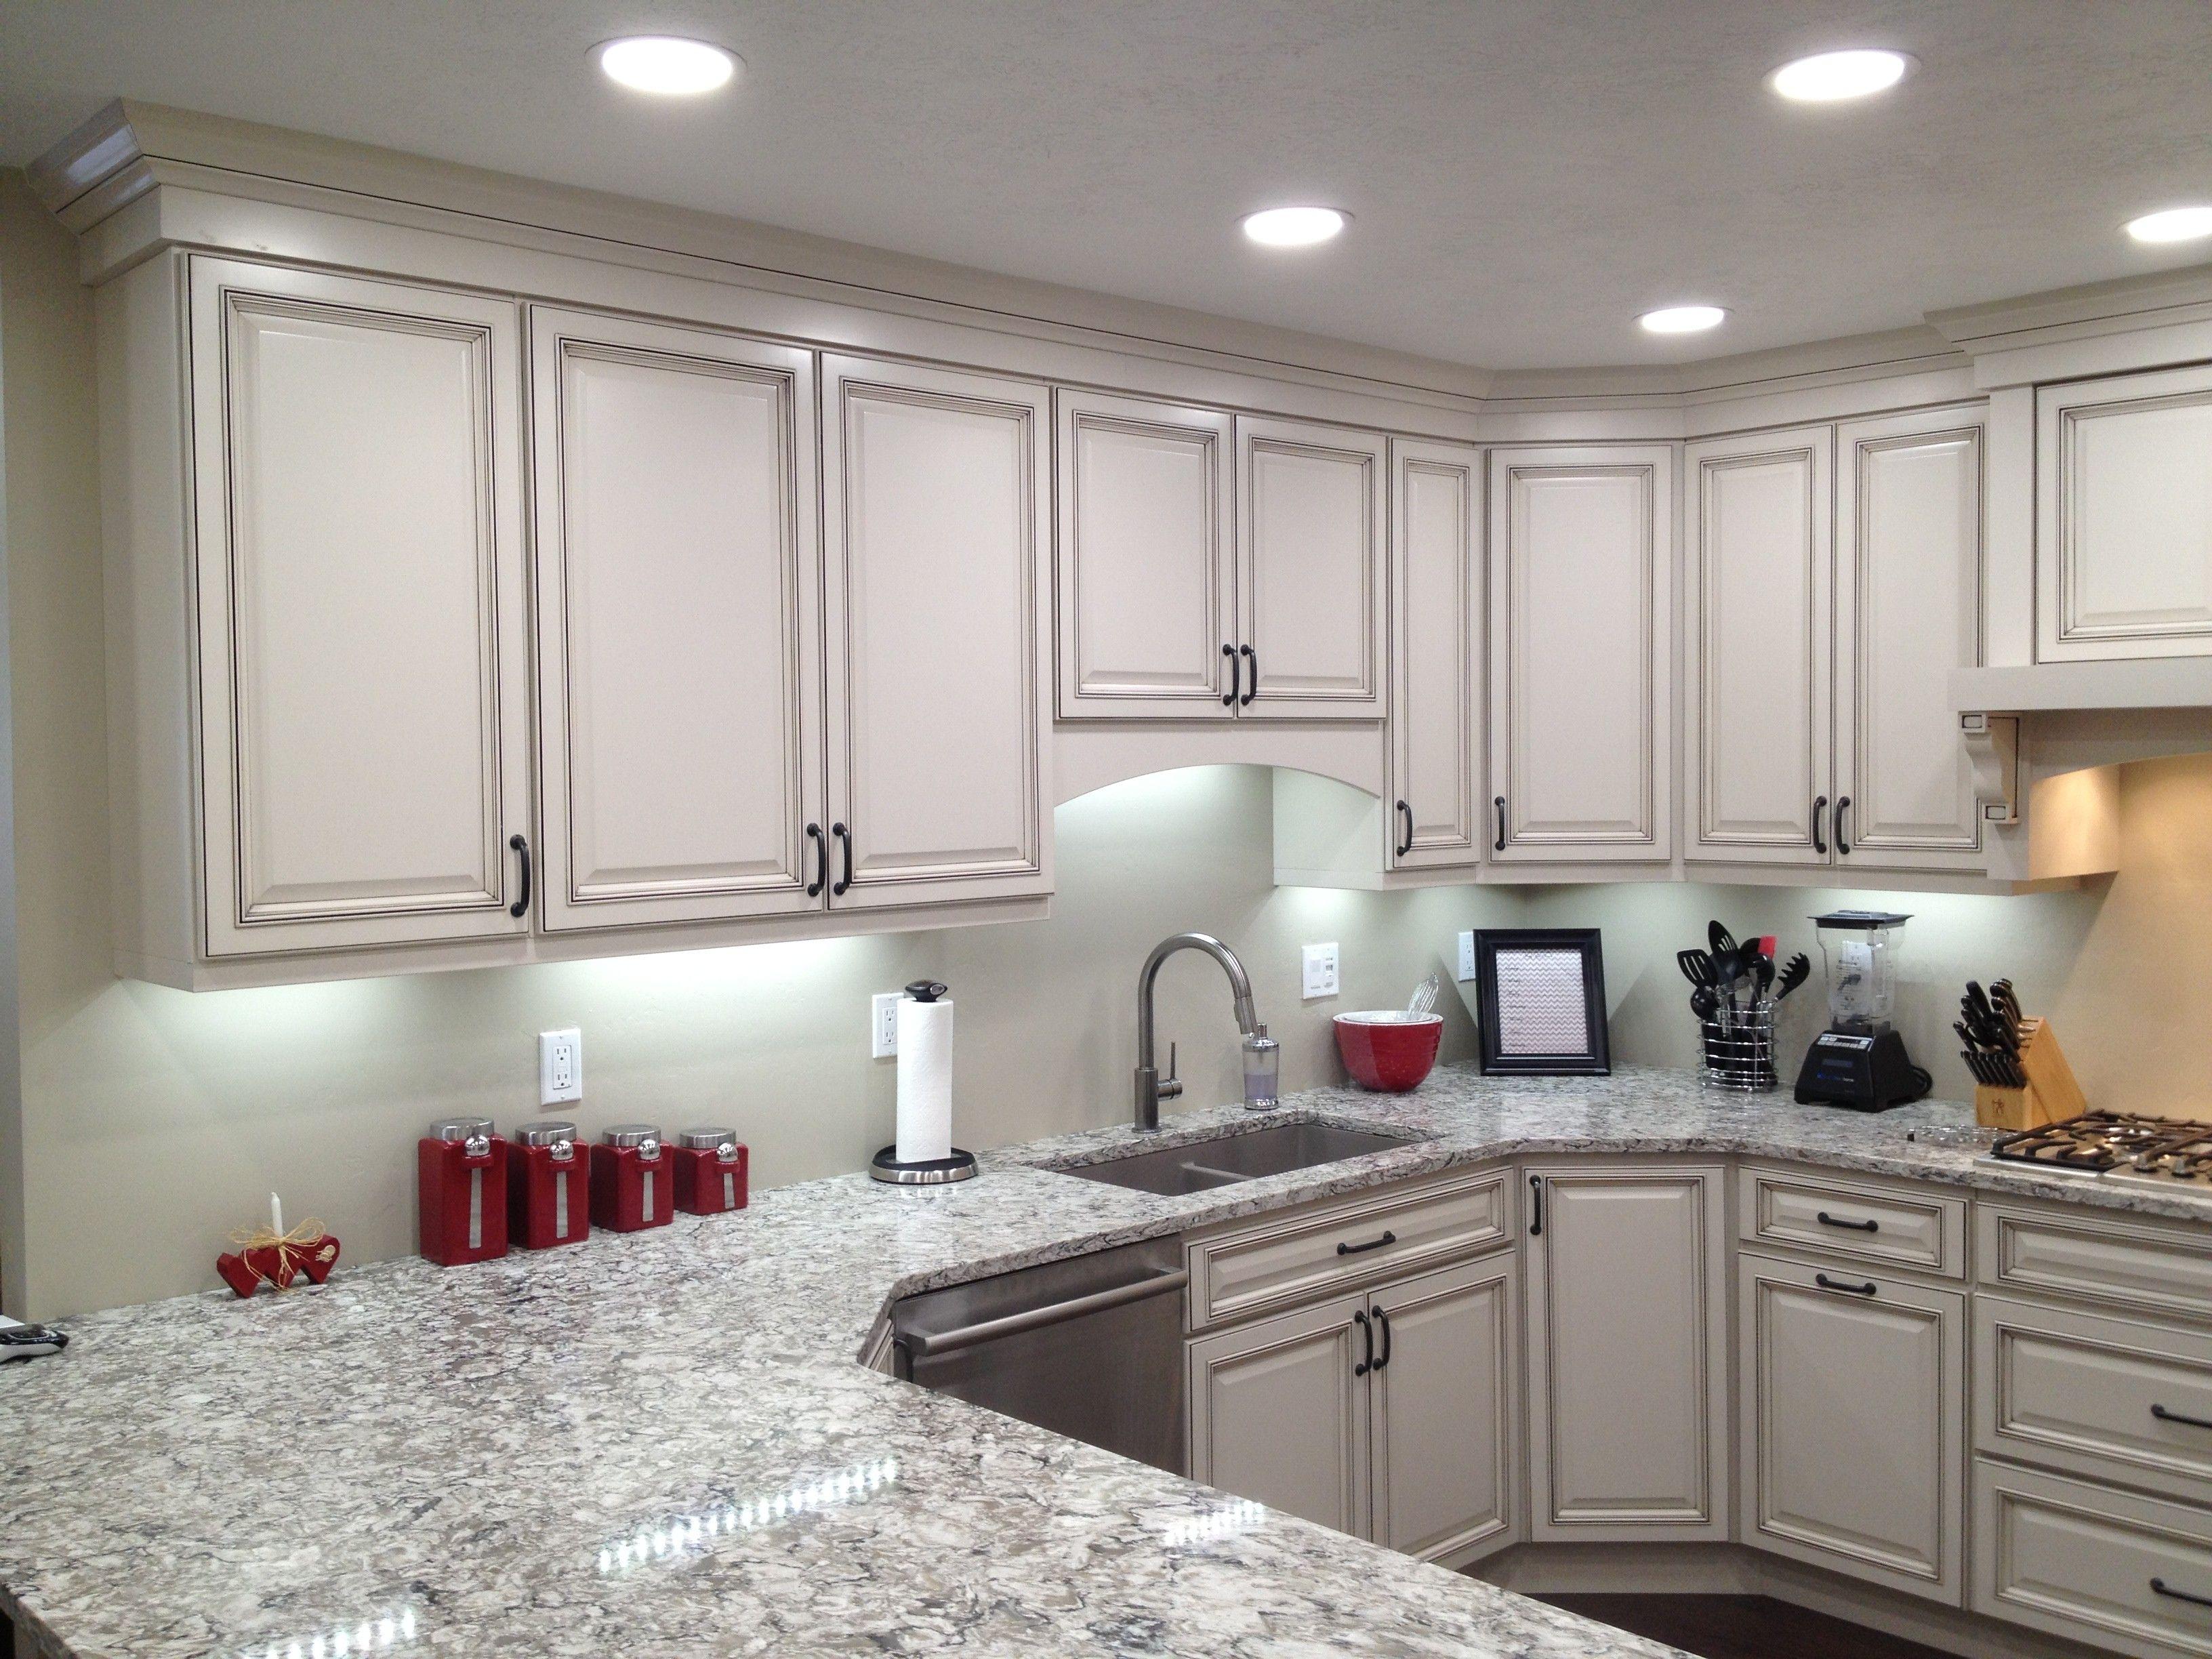 Best Of Wiring Diagram Under Cabinet Lighting Diagrams Digramssample Diagramimages Kitchen Under Cabinet Lighting Kitchen Renovation Led Recessed Lighting